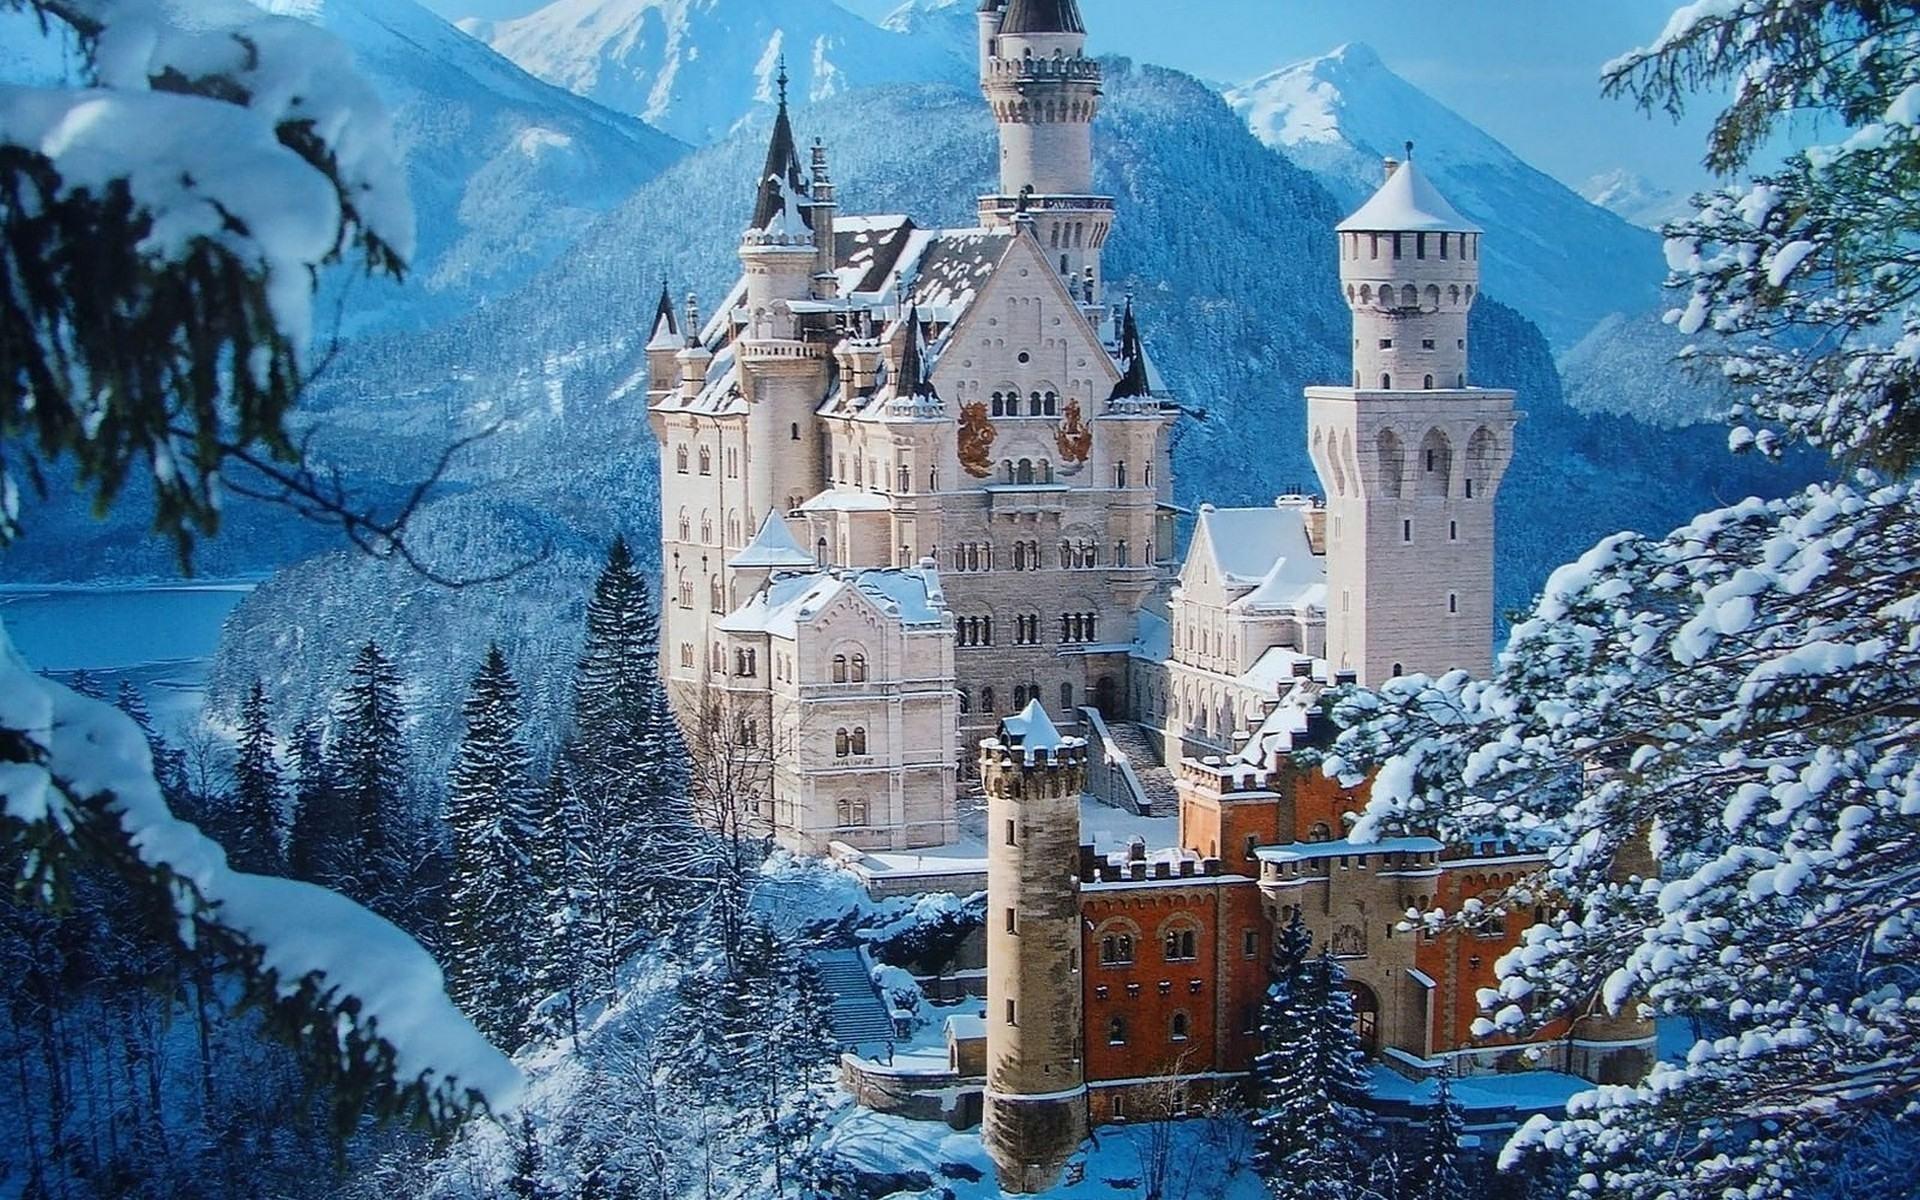 Winter Screensavers Image